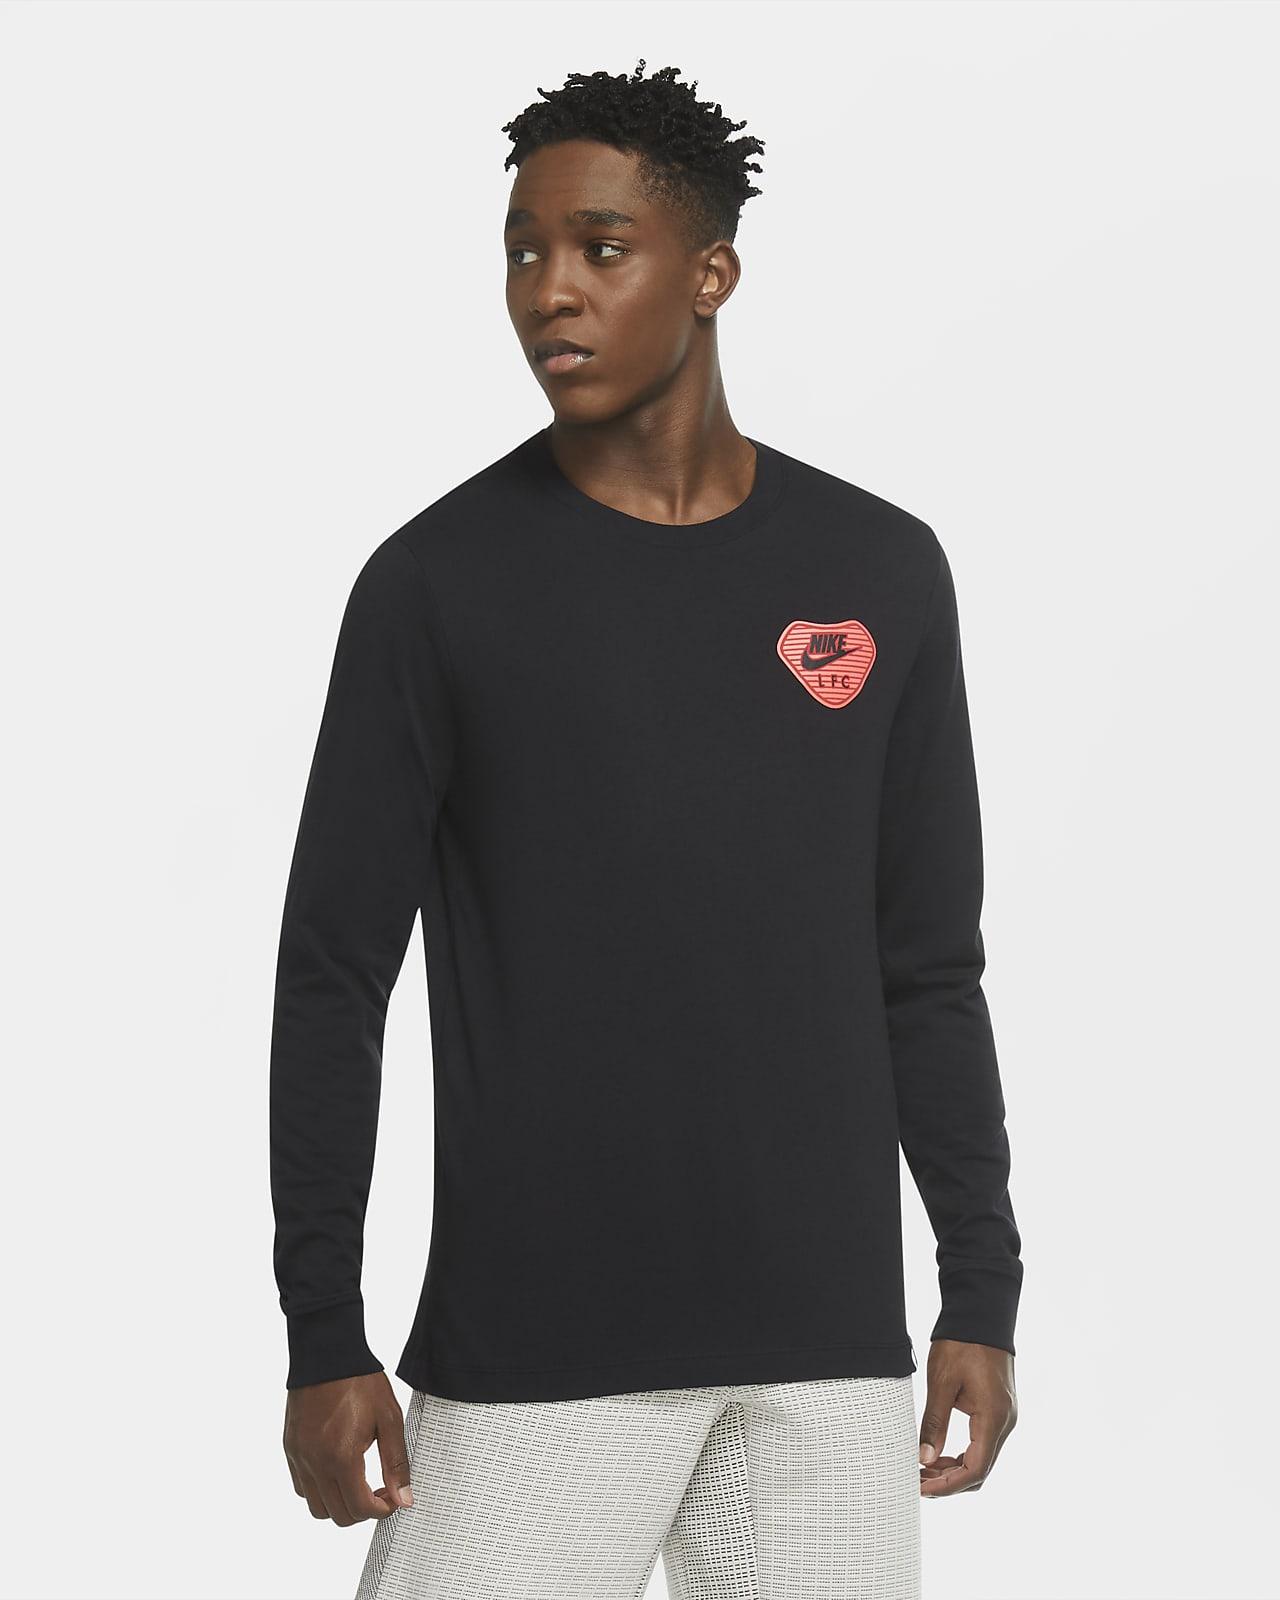 Camisola de futebol de manga comprida Liverpool FC para homem